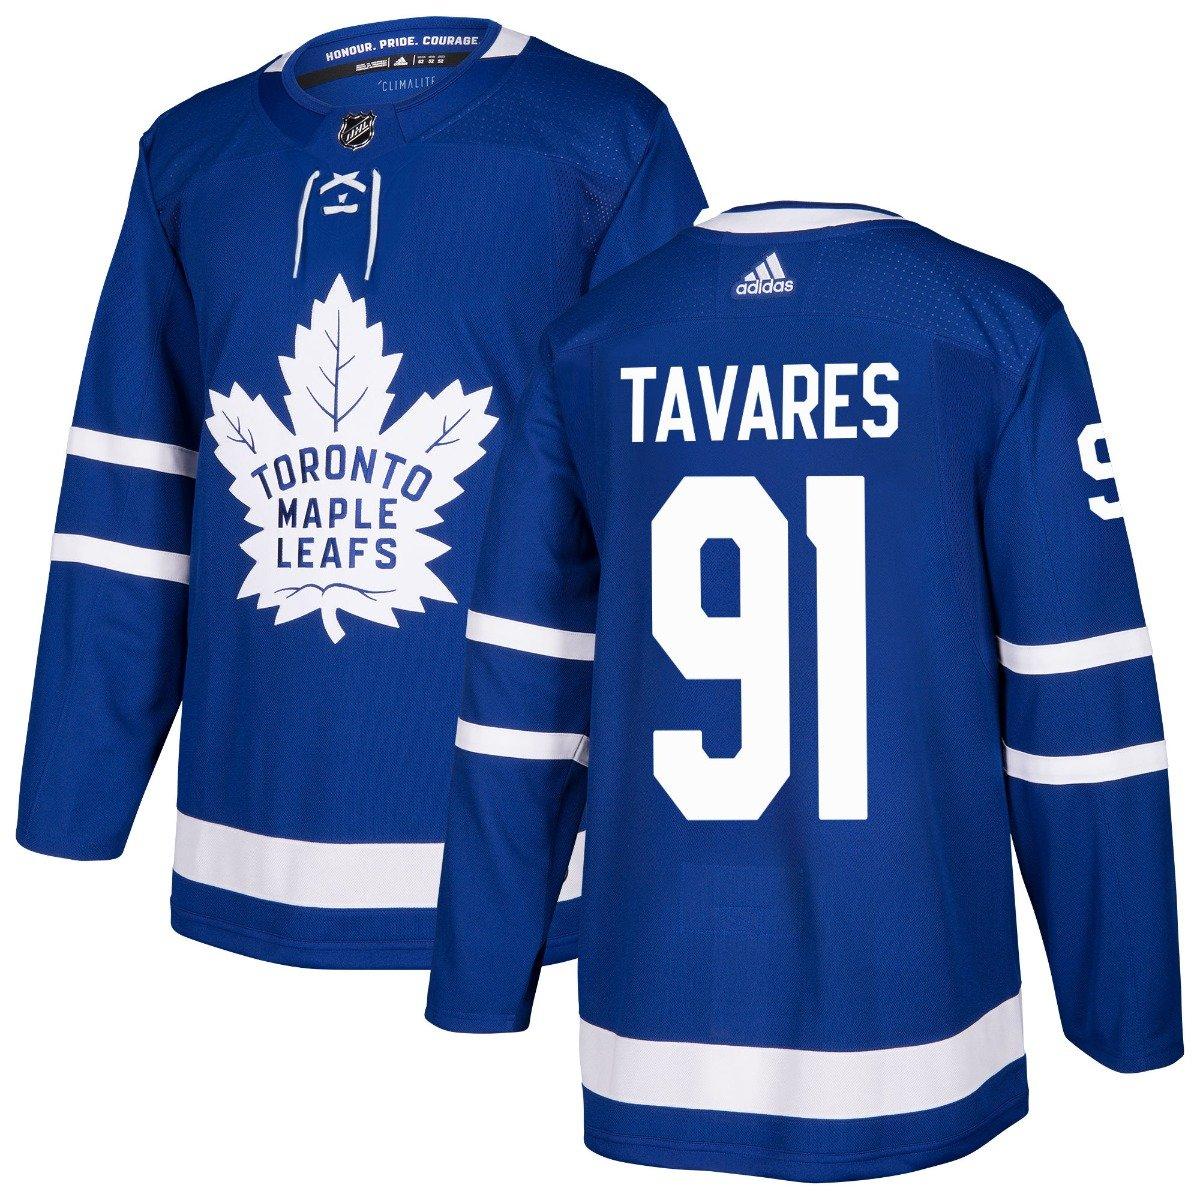 check out 37fb0 4f274 Amazon.com : adidas John Tavares Toronto Maple Leafs NHL ...